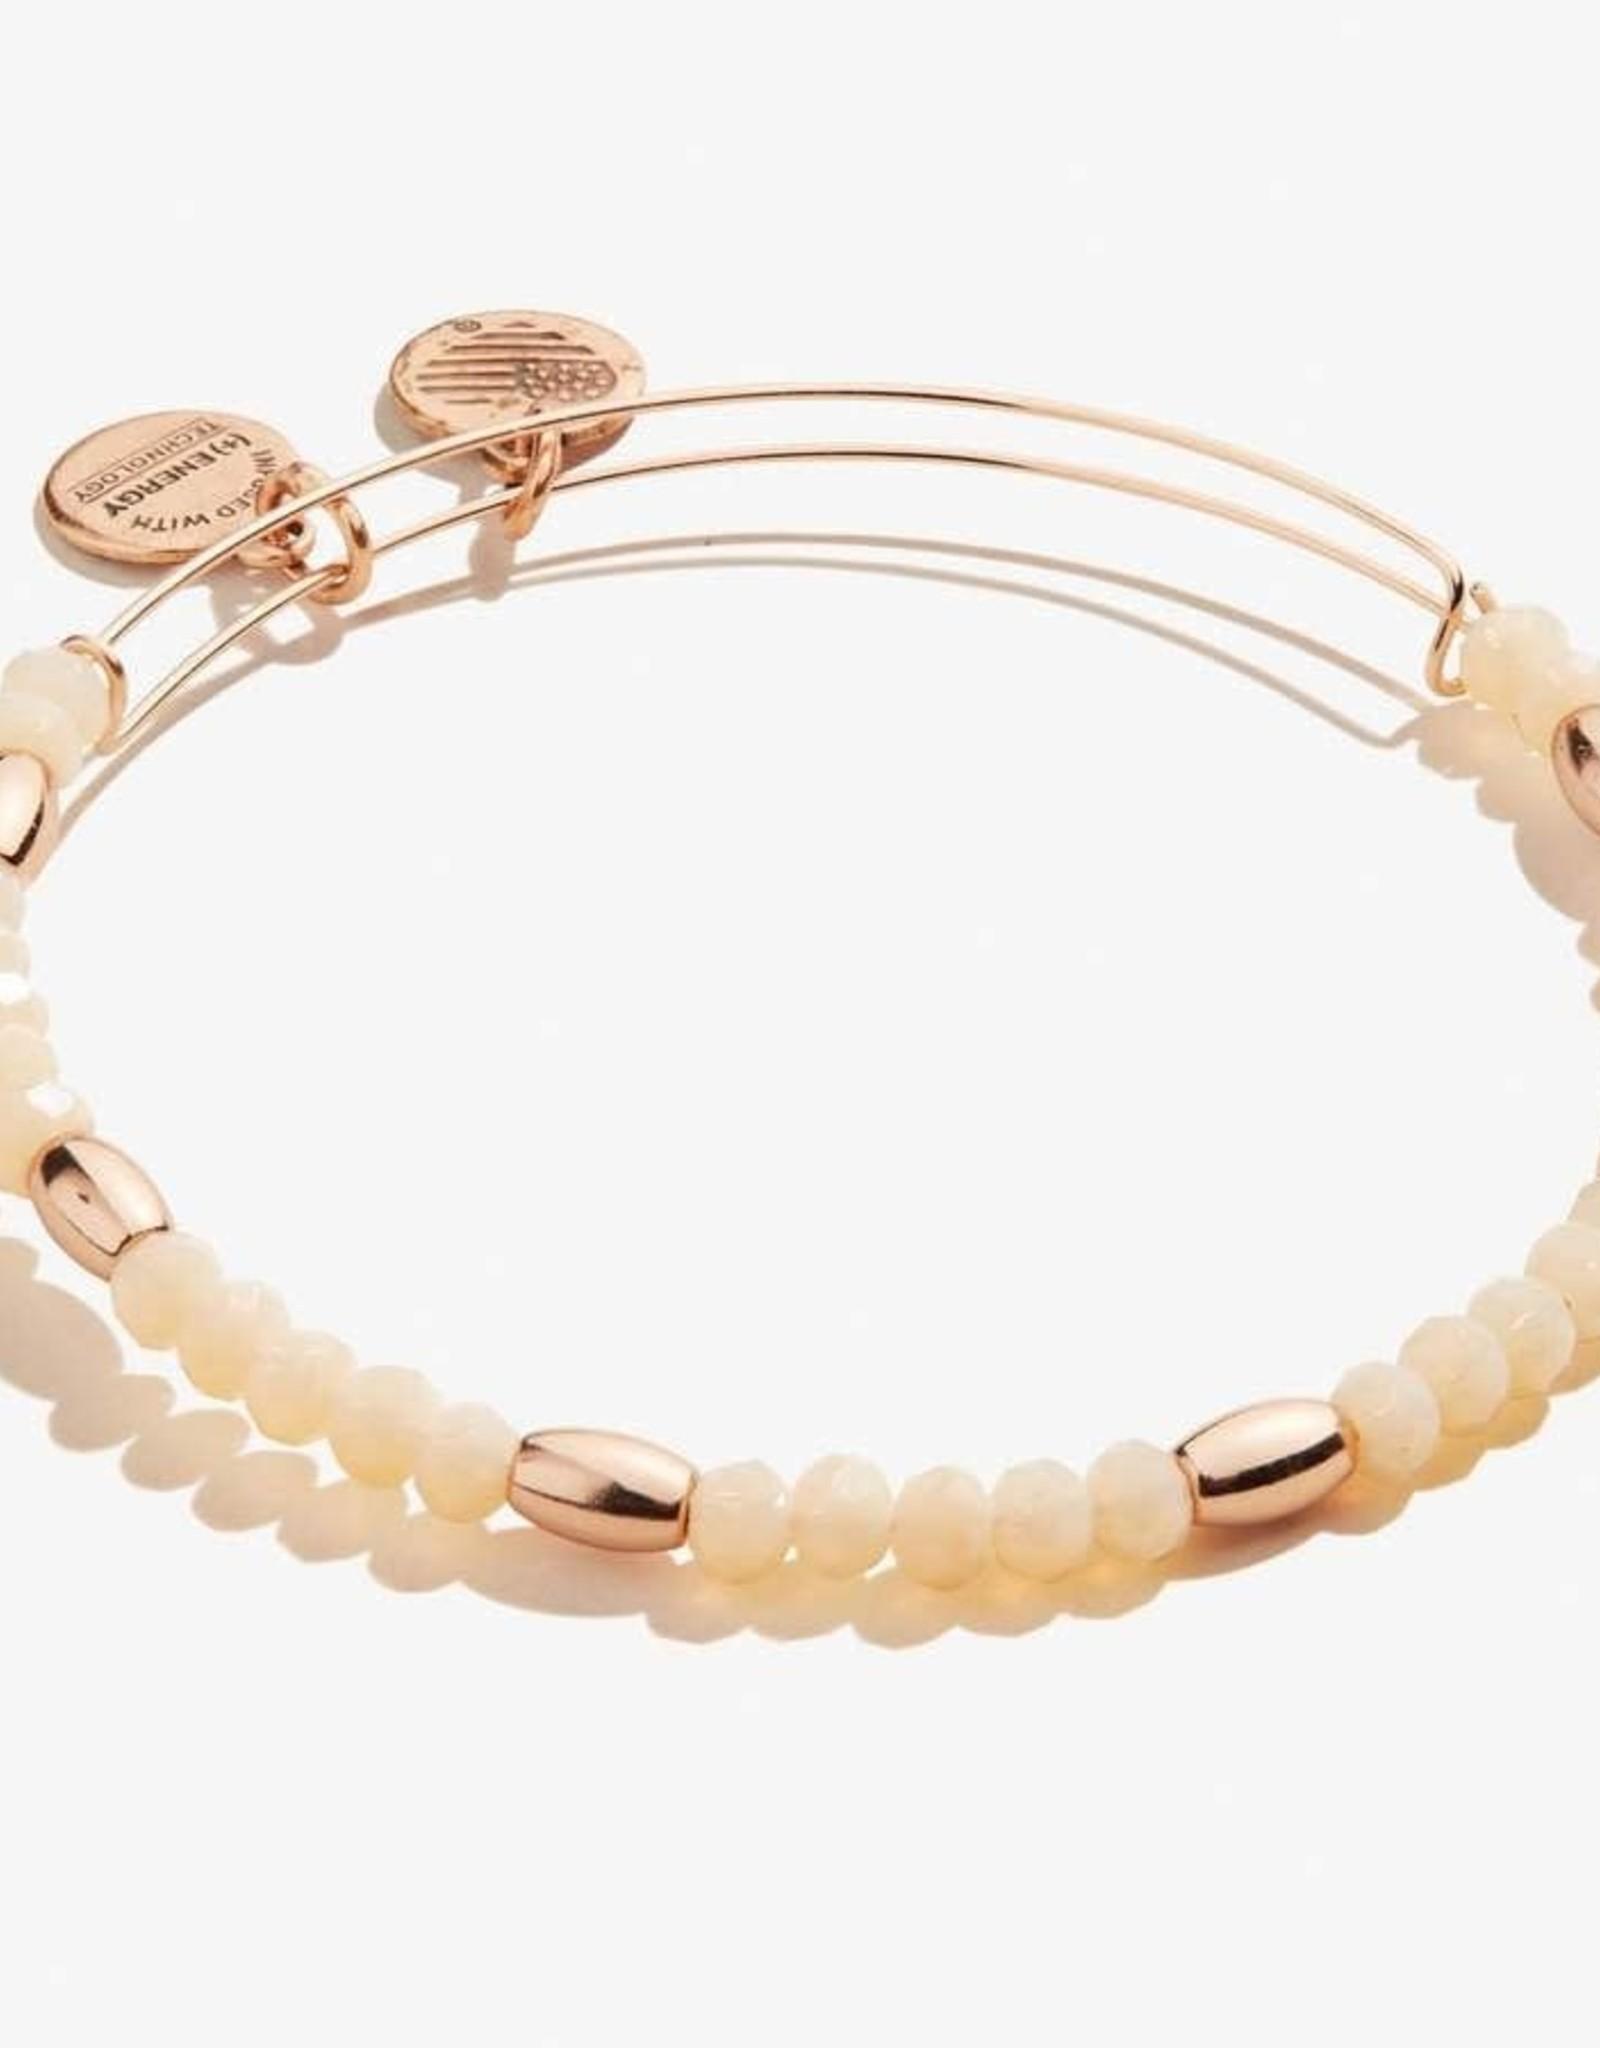 Alex and Ani Balance Bead II, Caramel, Shiny Rose Gold